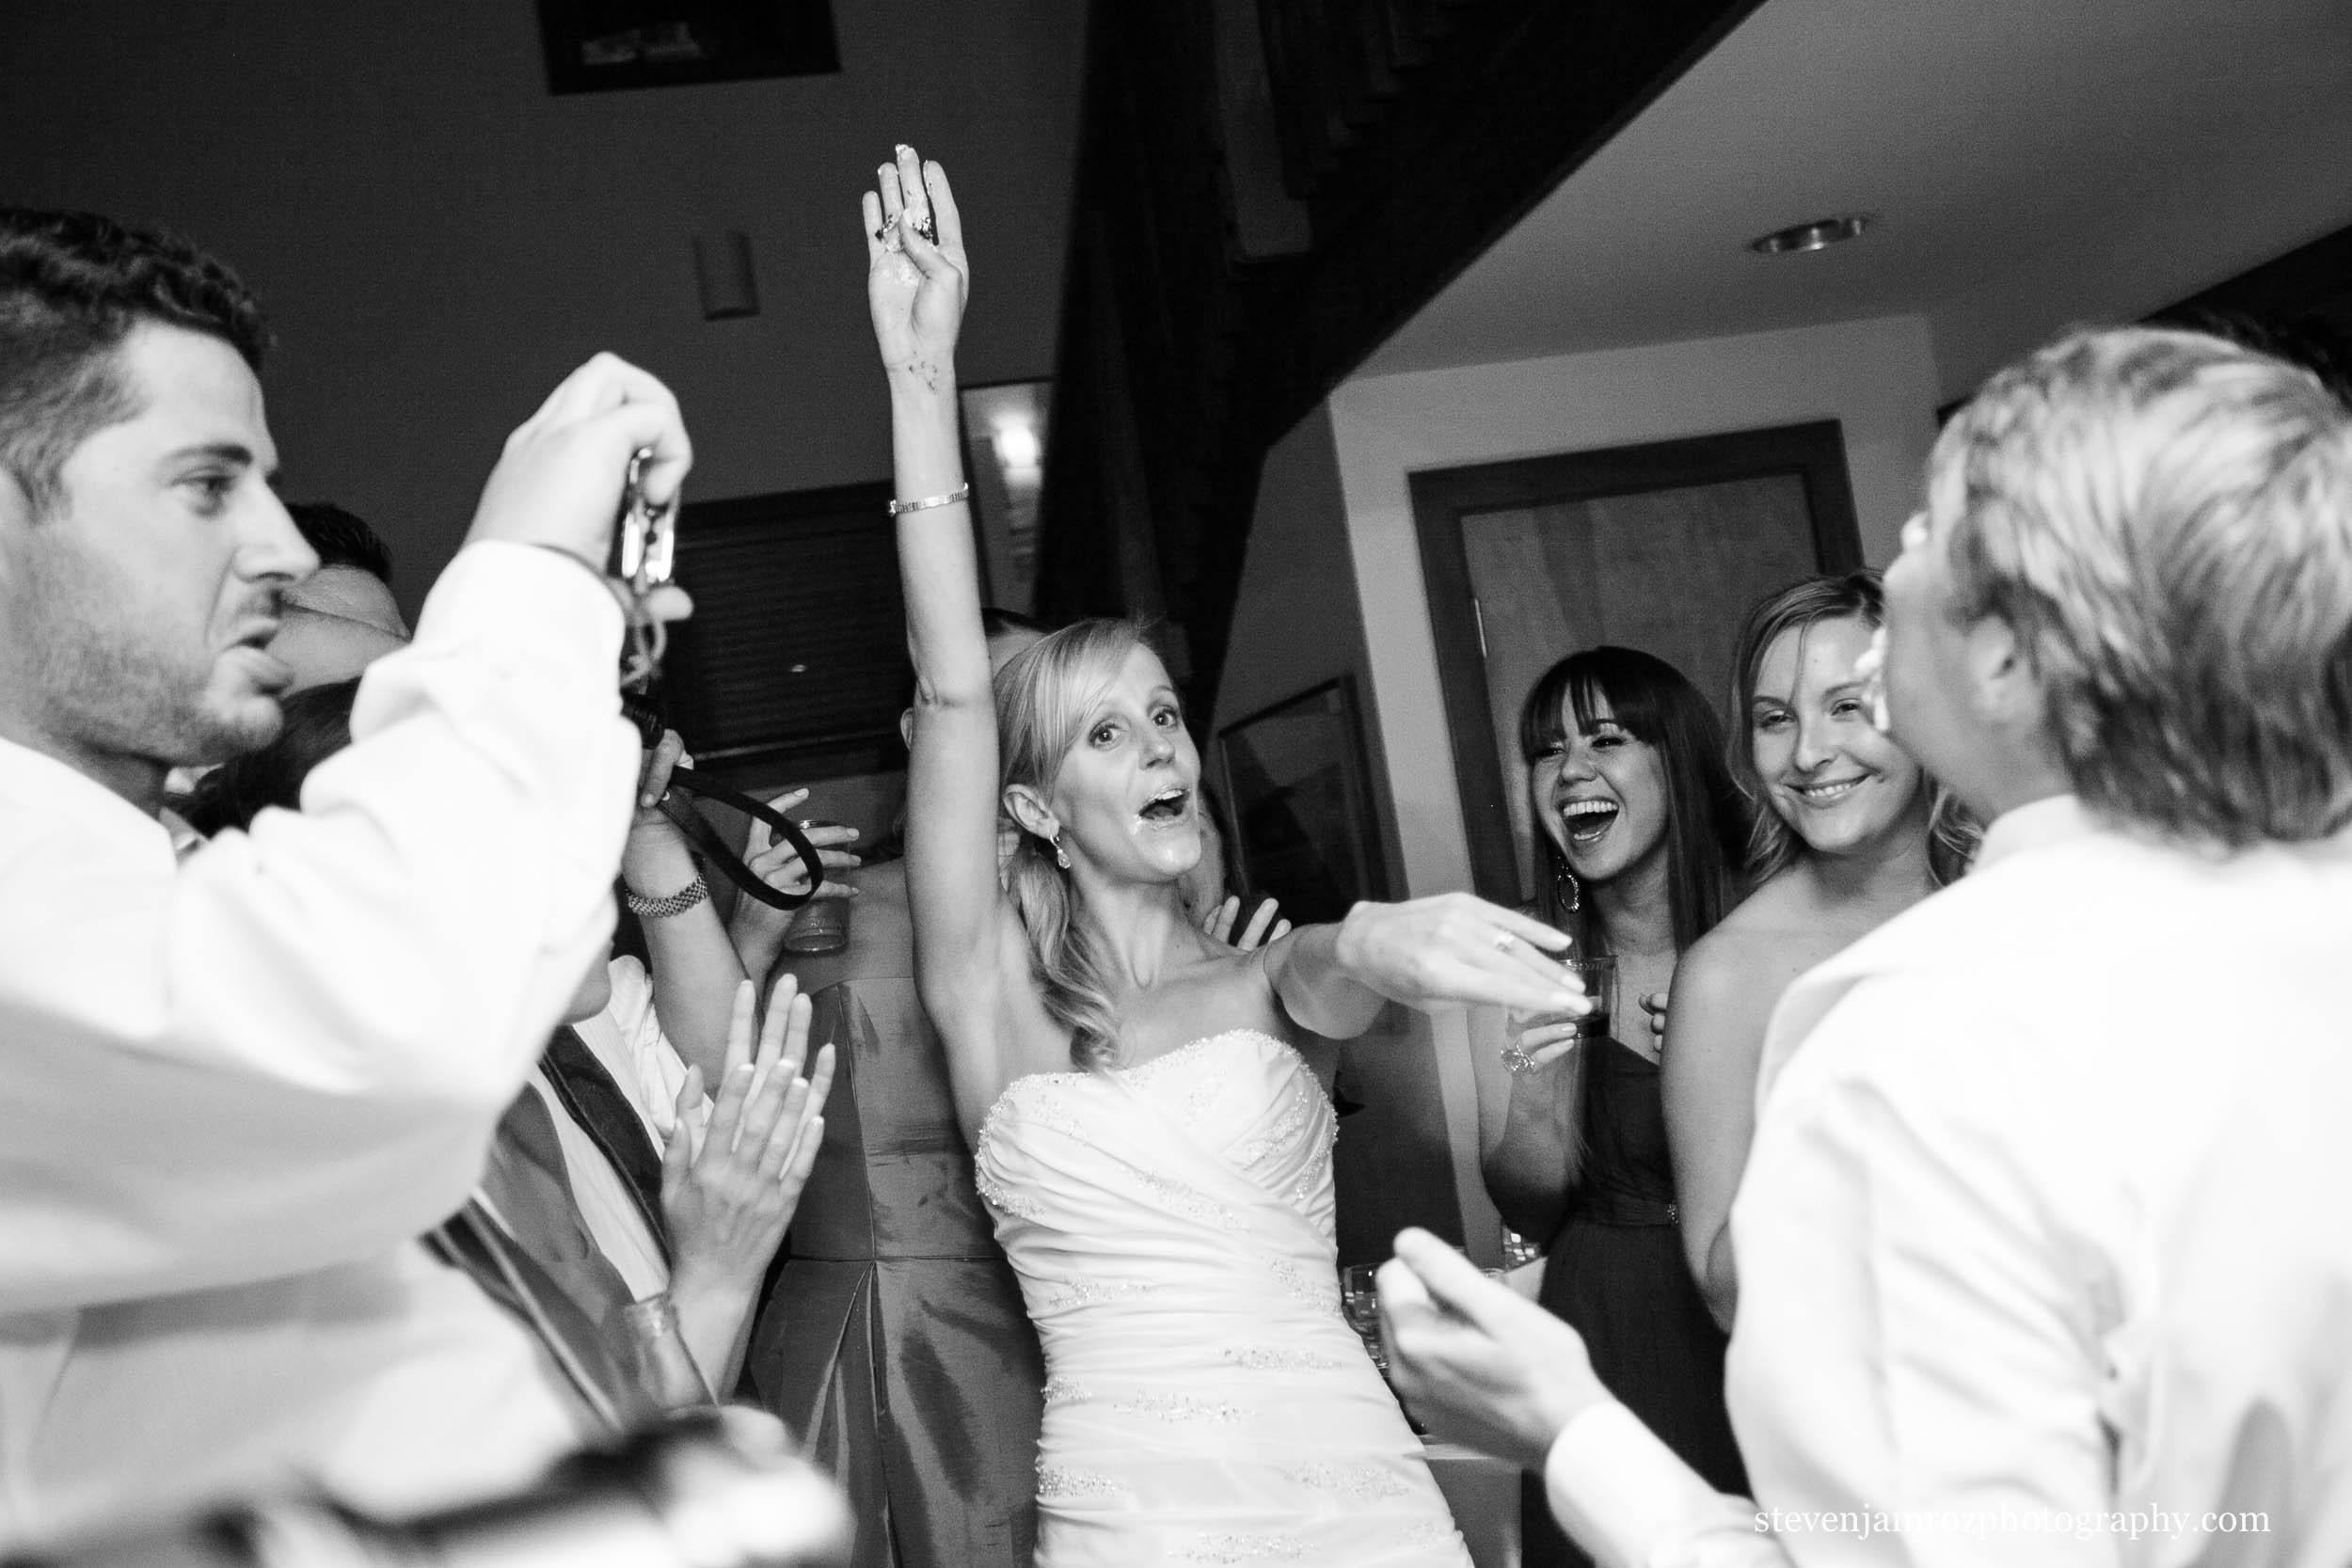 cake-in-grooms-face-wedding-raleigh-steven-jamroz-photography-0278.jpg